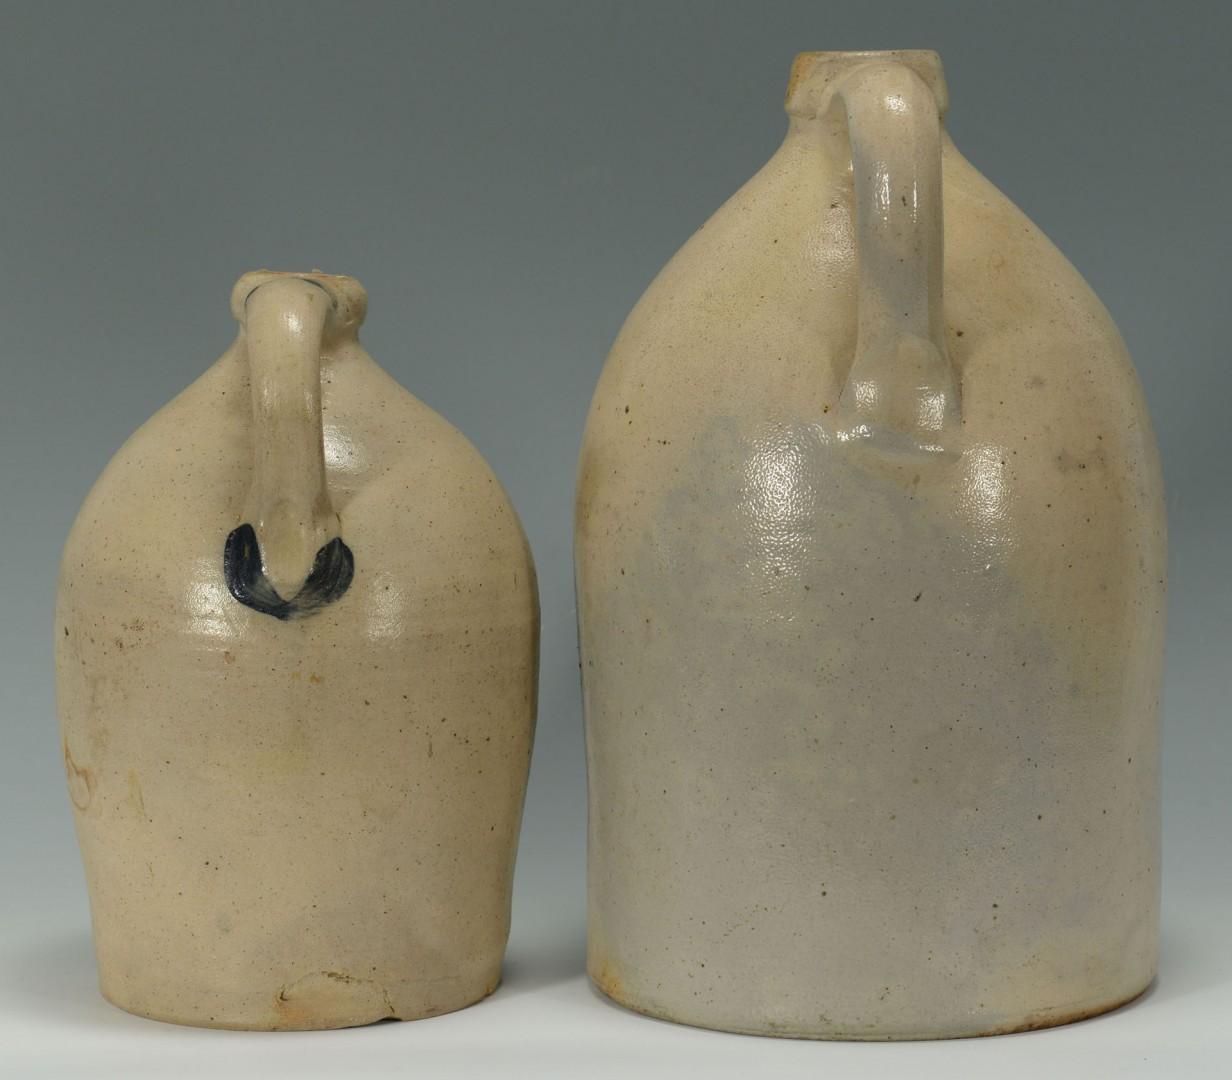 Lot 456: 2 Cobalt Decorated Stoneware Jugs, New England